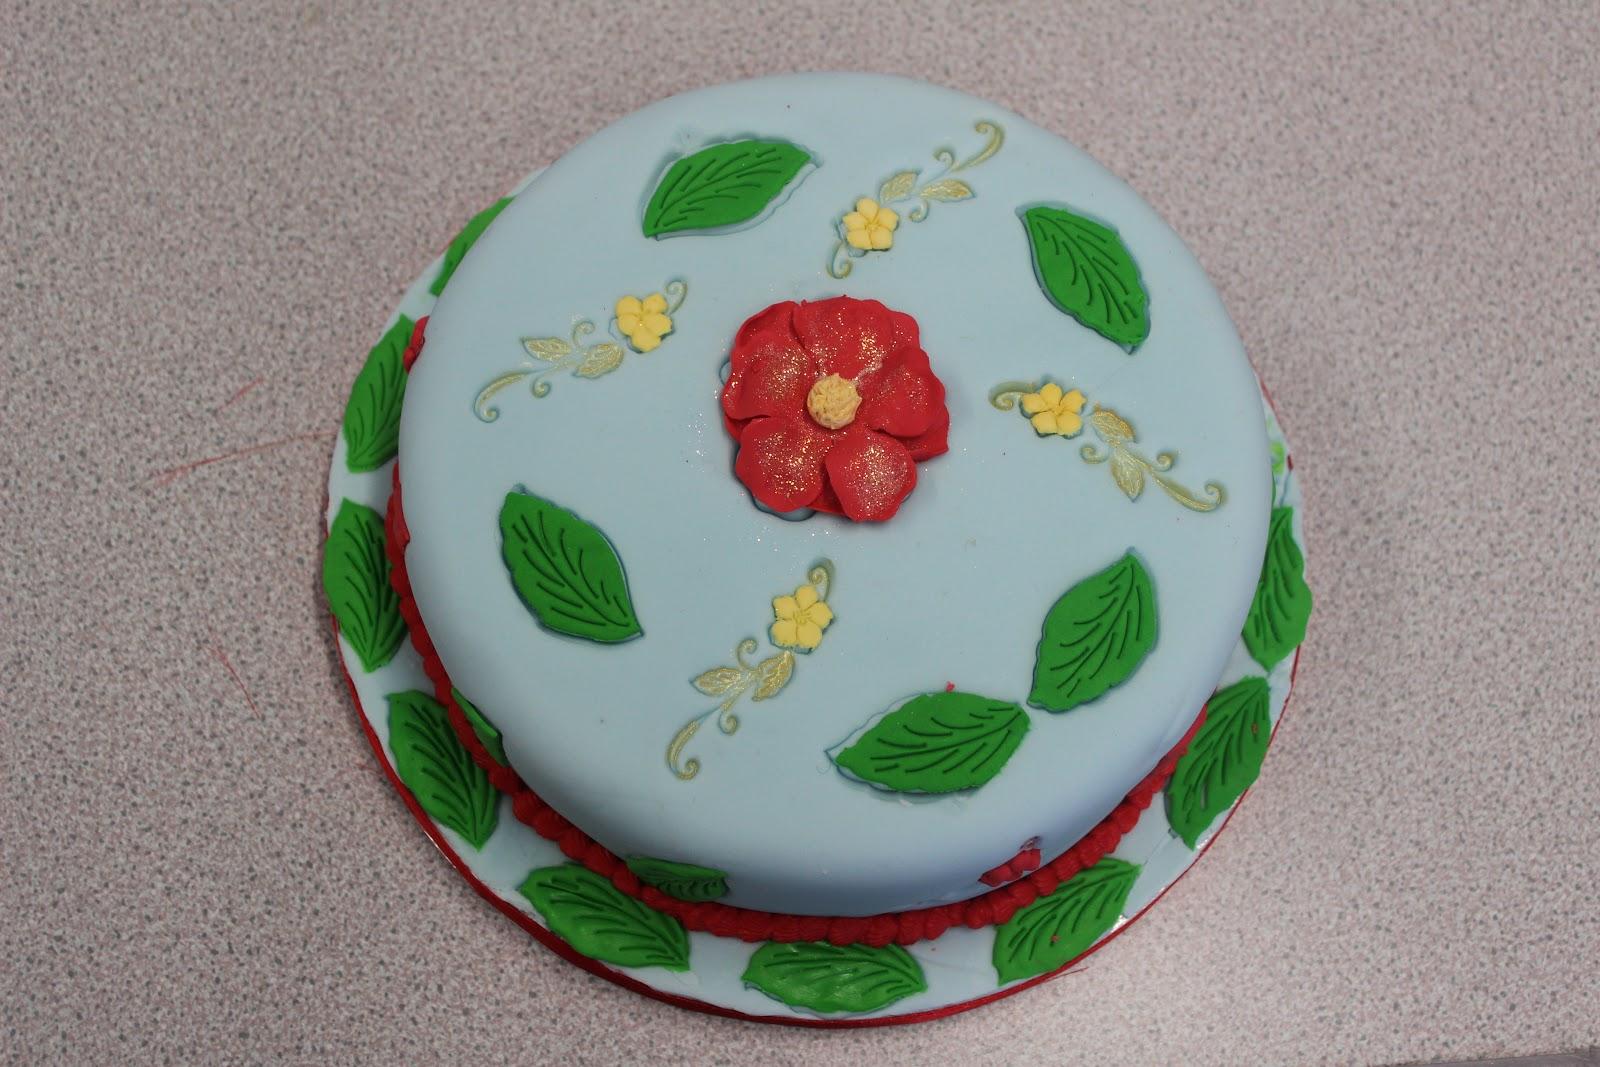 Cake And Art Decor Centre : Flour Power Cake Journey: Christmas Cake Decorating at ...